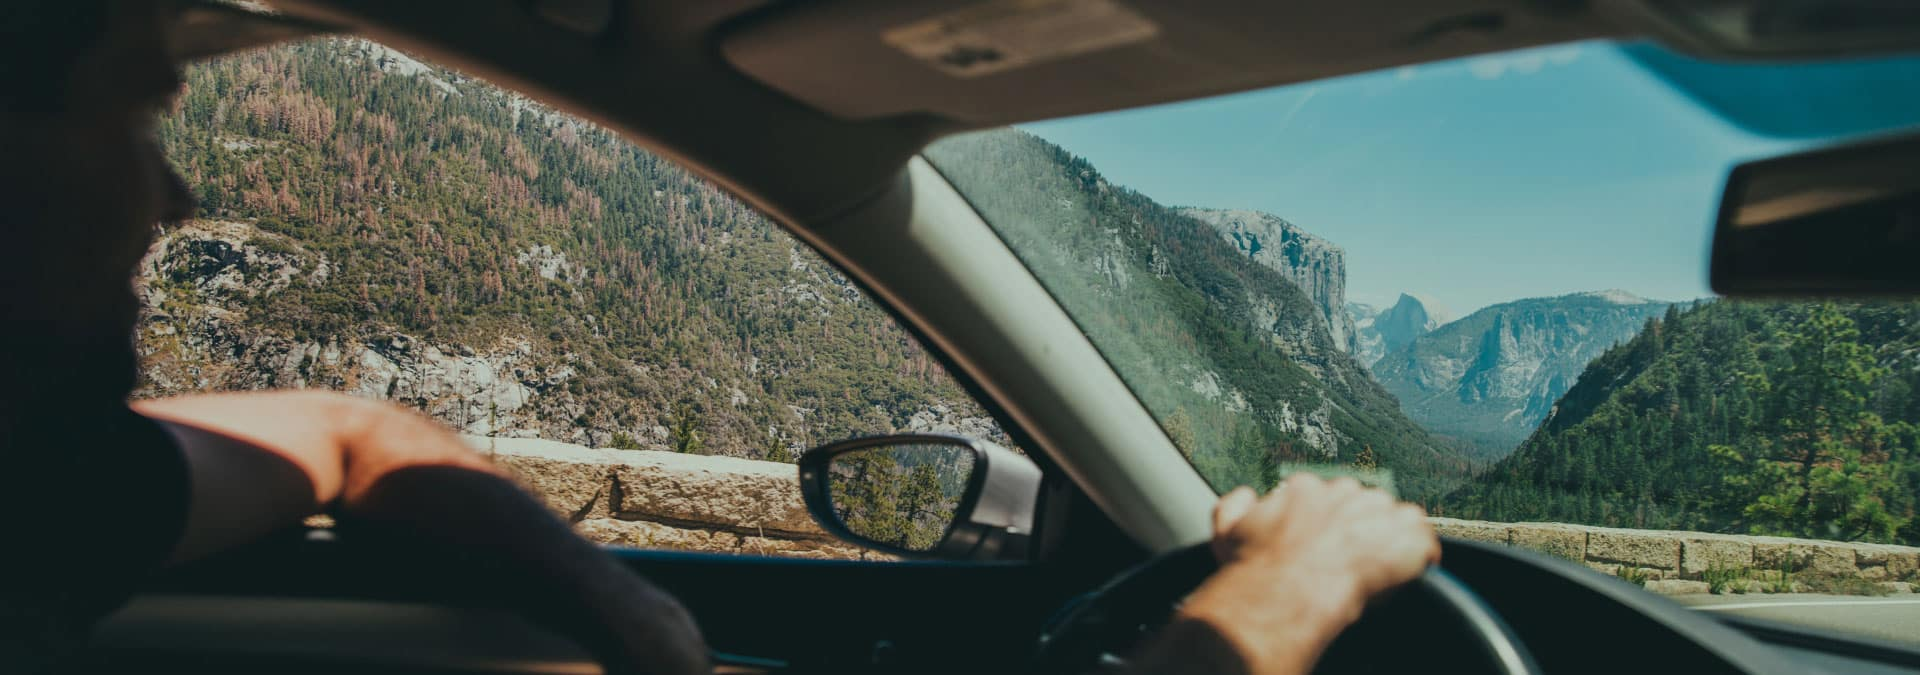 Driving through Mountains